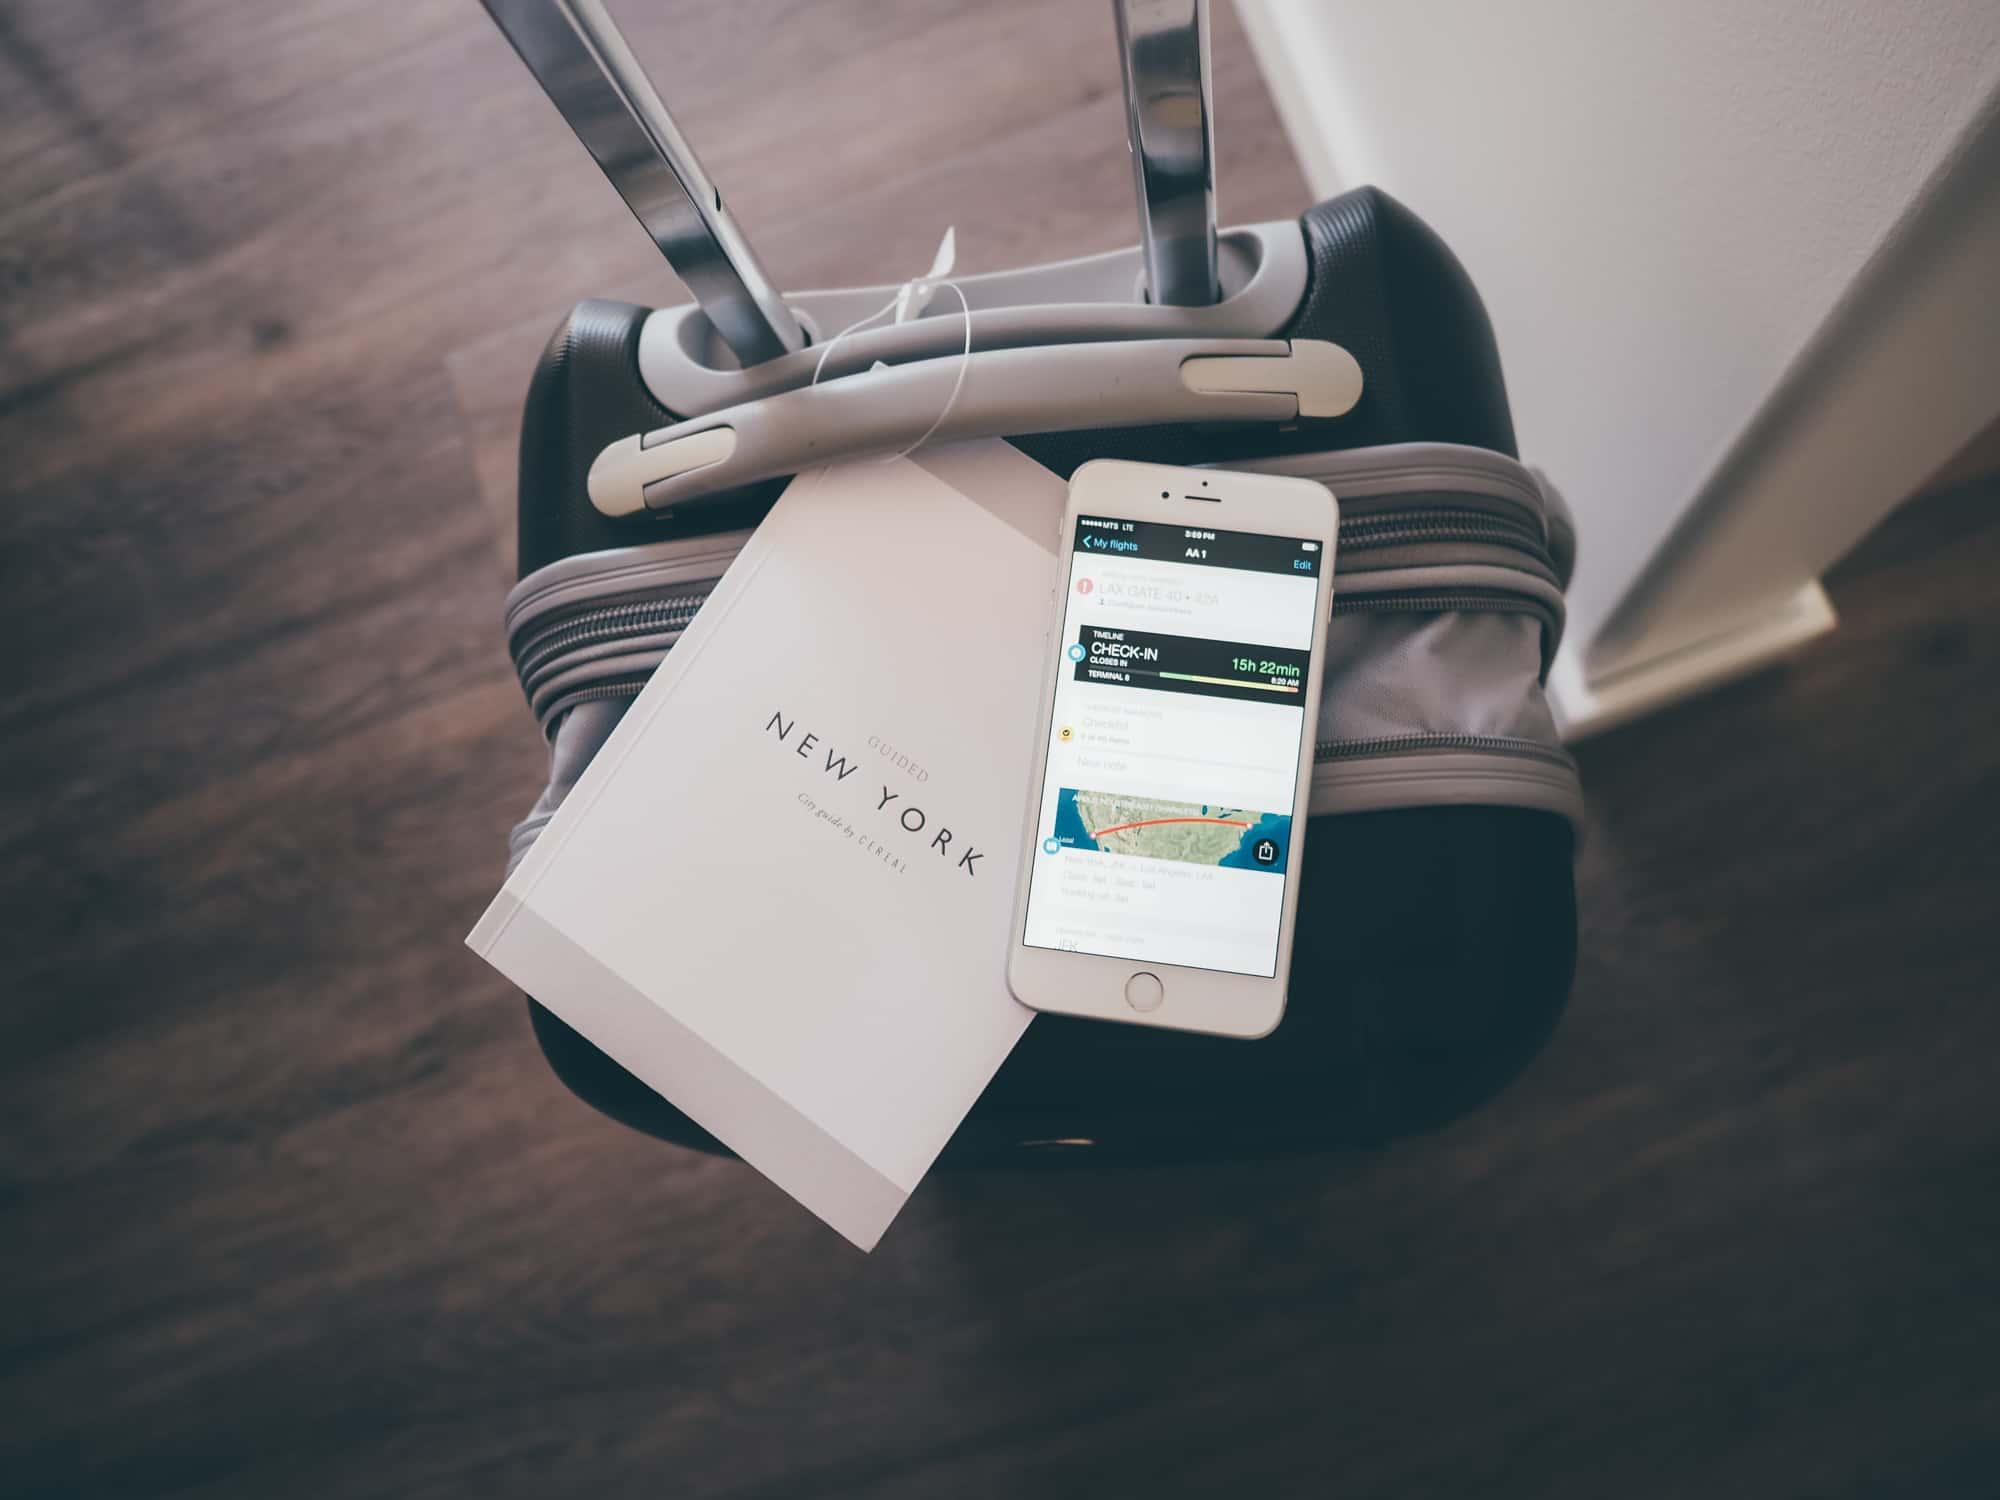 программа App in the Air - 6 Гигабайт на месяц за 10 евро – оптимальная цена Интернета в Европе